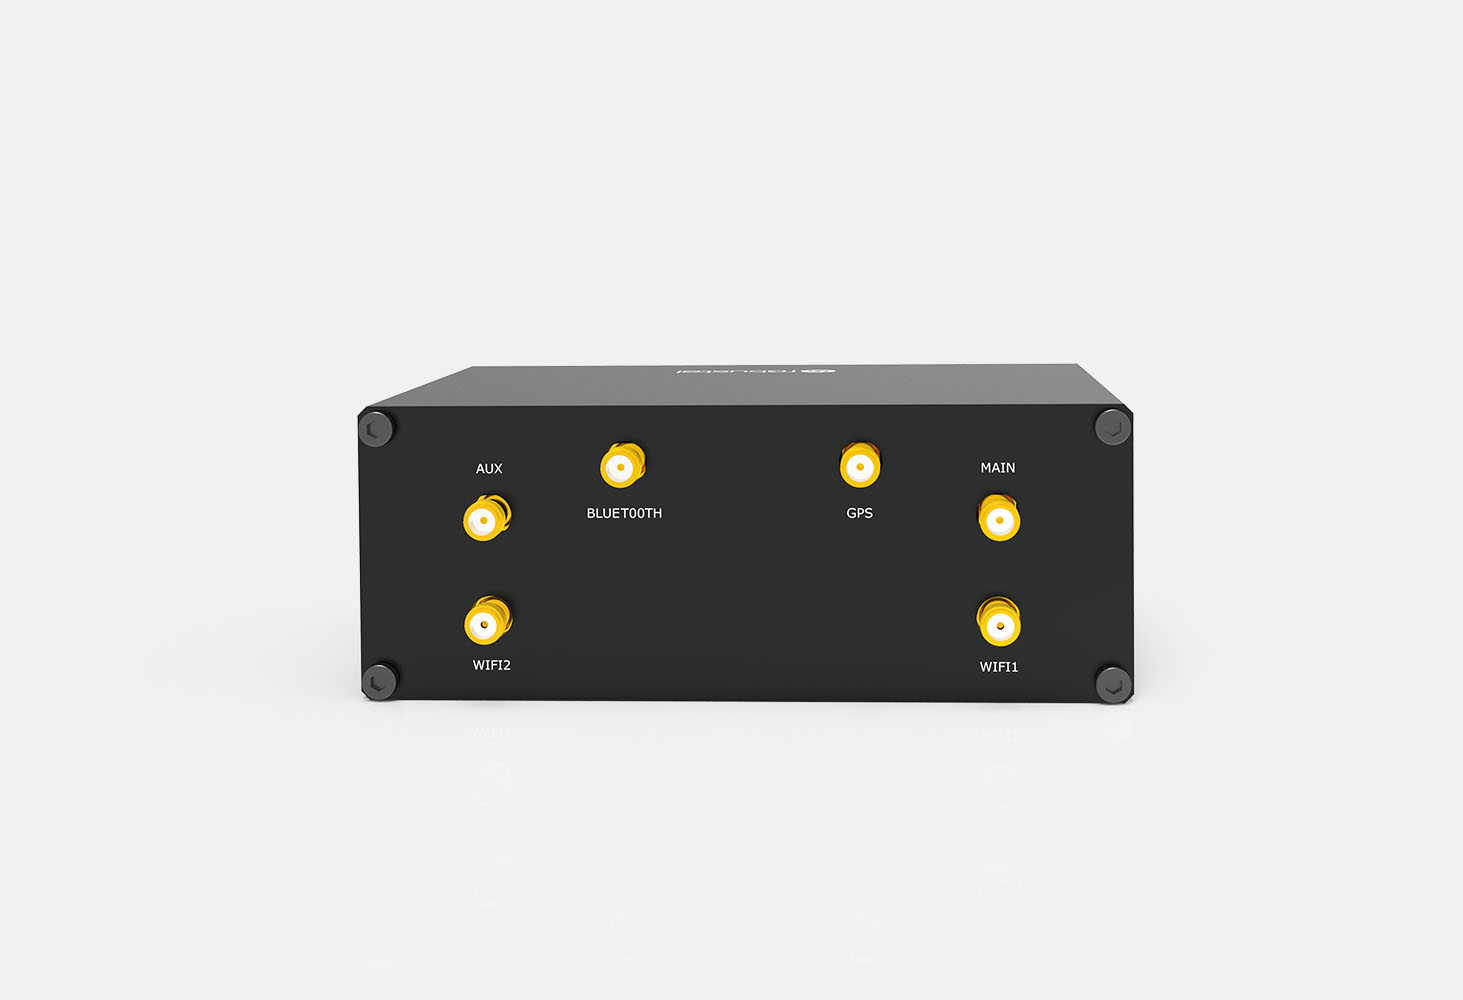 R2110 LTE Advanced IoT Gateway